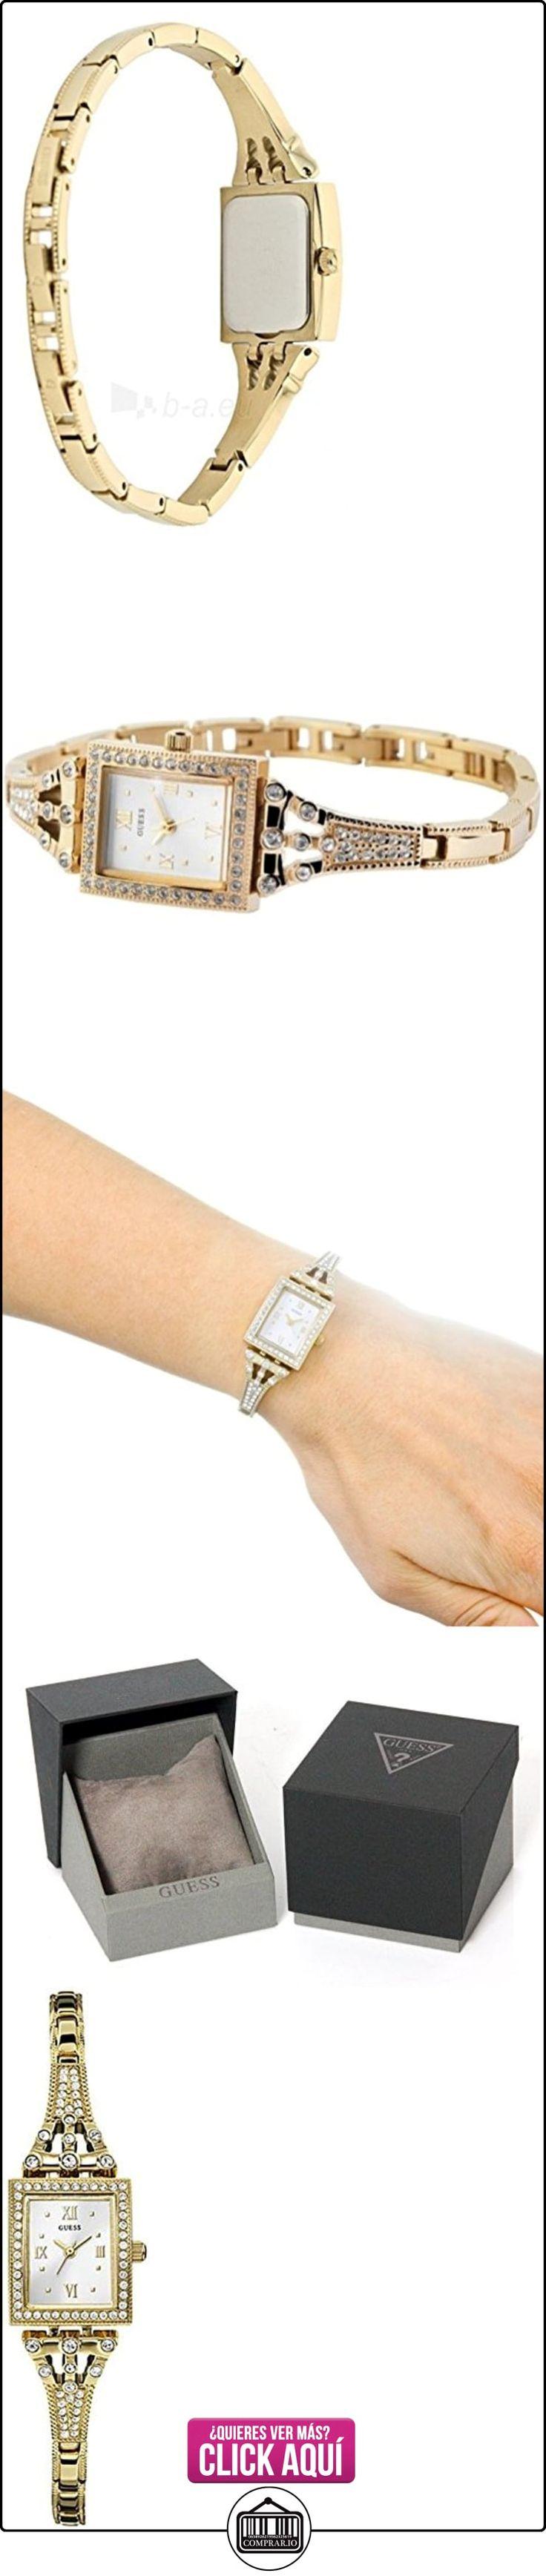 Guess - Reloj de cuarzo para mujer, correa de acero inoxidable, dorado  ✿ Relojes para mujer - (Gama media/alta) ✿ ▬► Ver oferta: https://comprar.io/goto/B00O411OEC